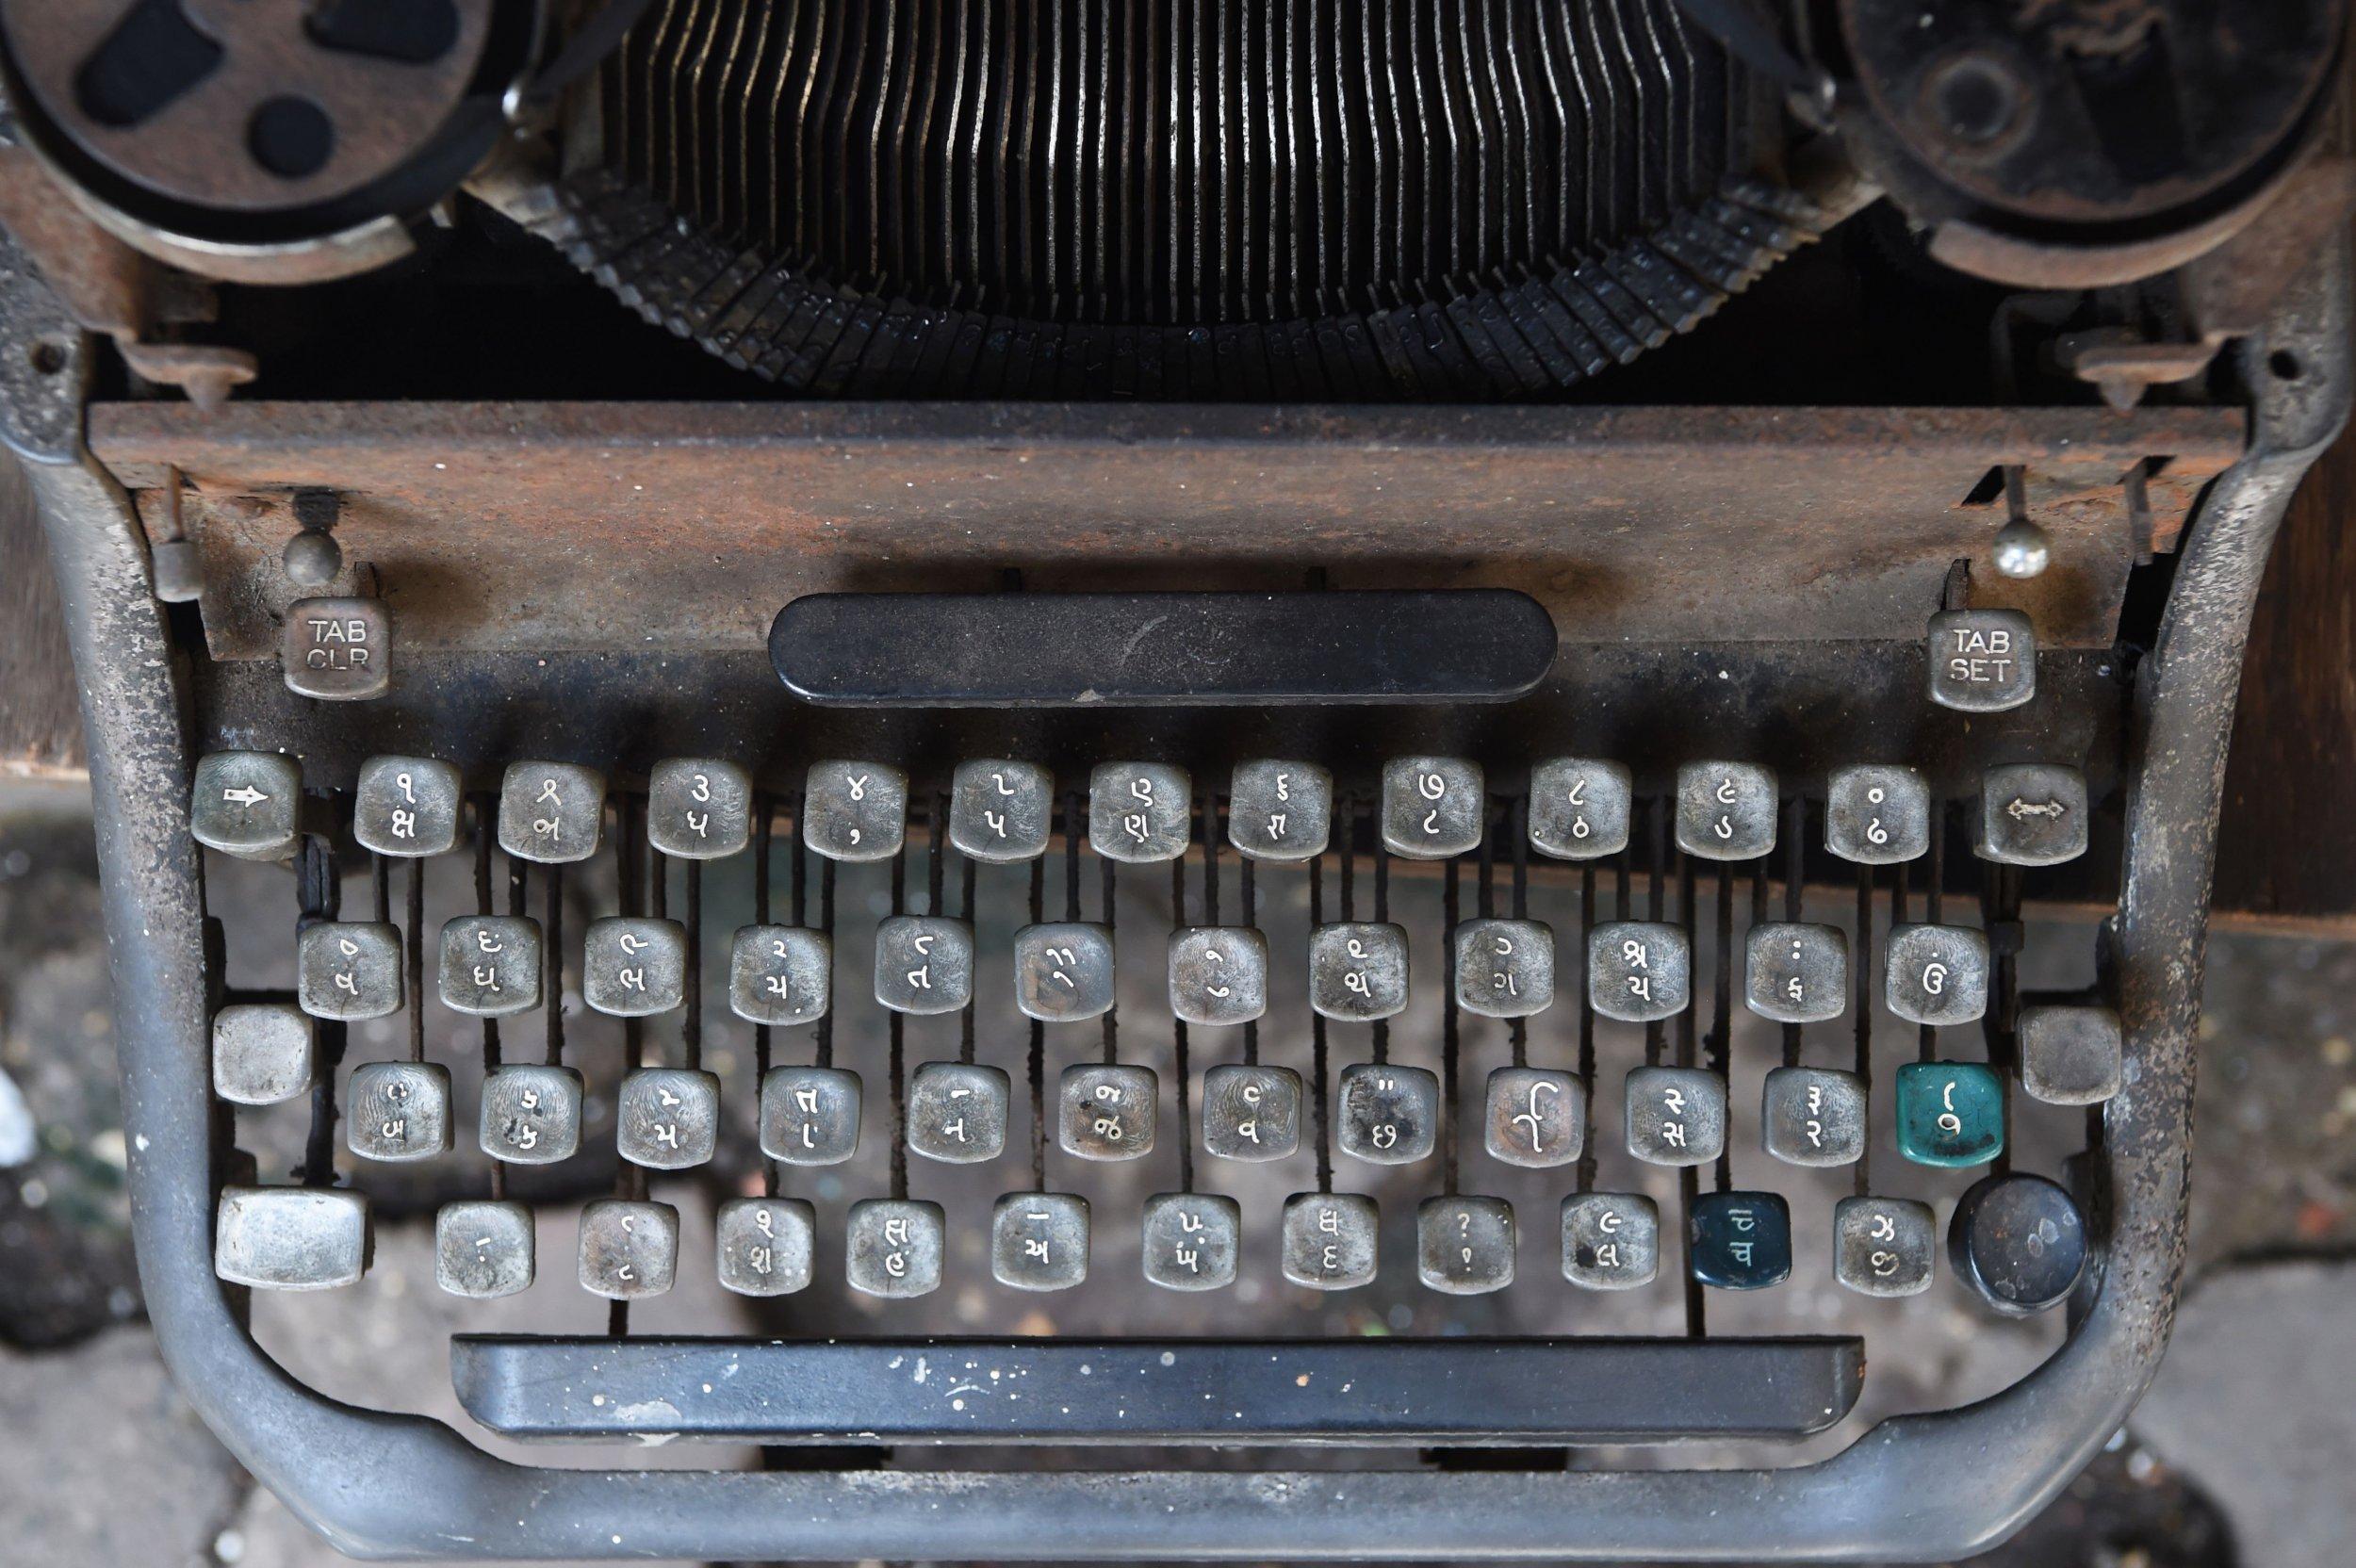 Defunct typewriter